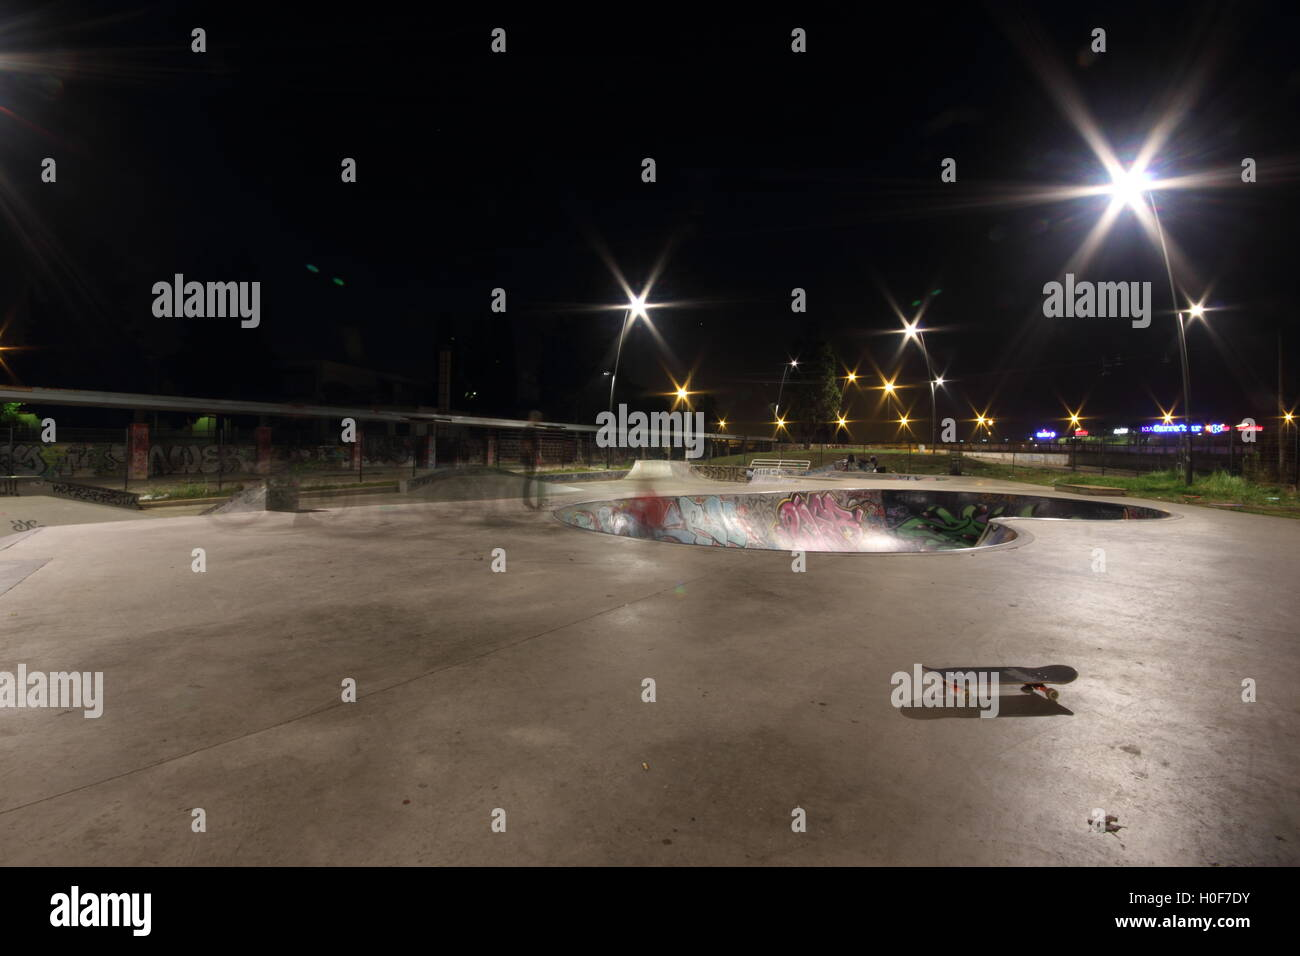 a Rome skateboard park by night, skateboarding, skateboard, skatepark - Stock Image